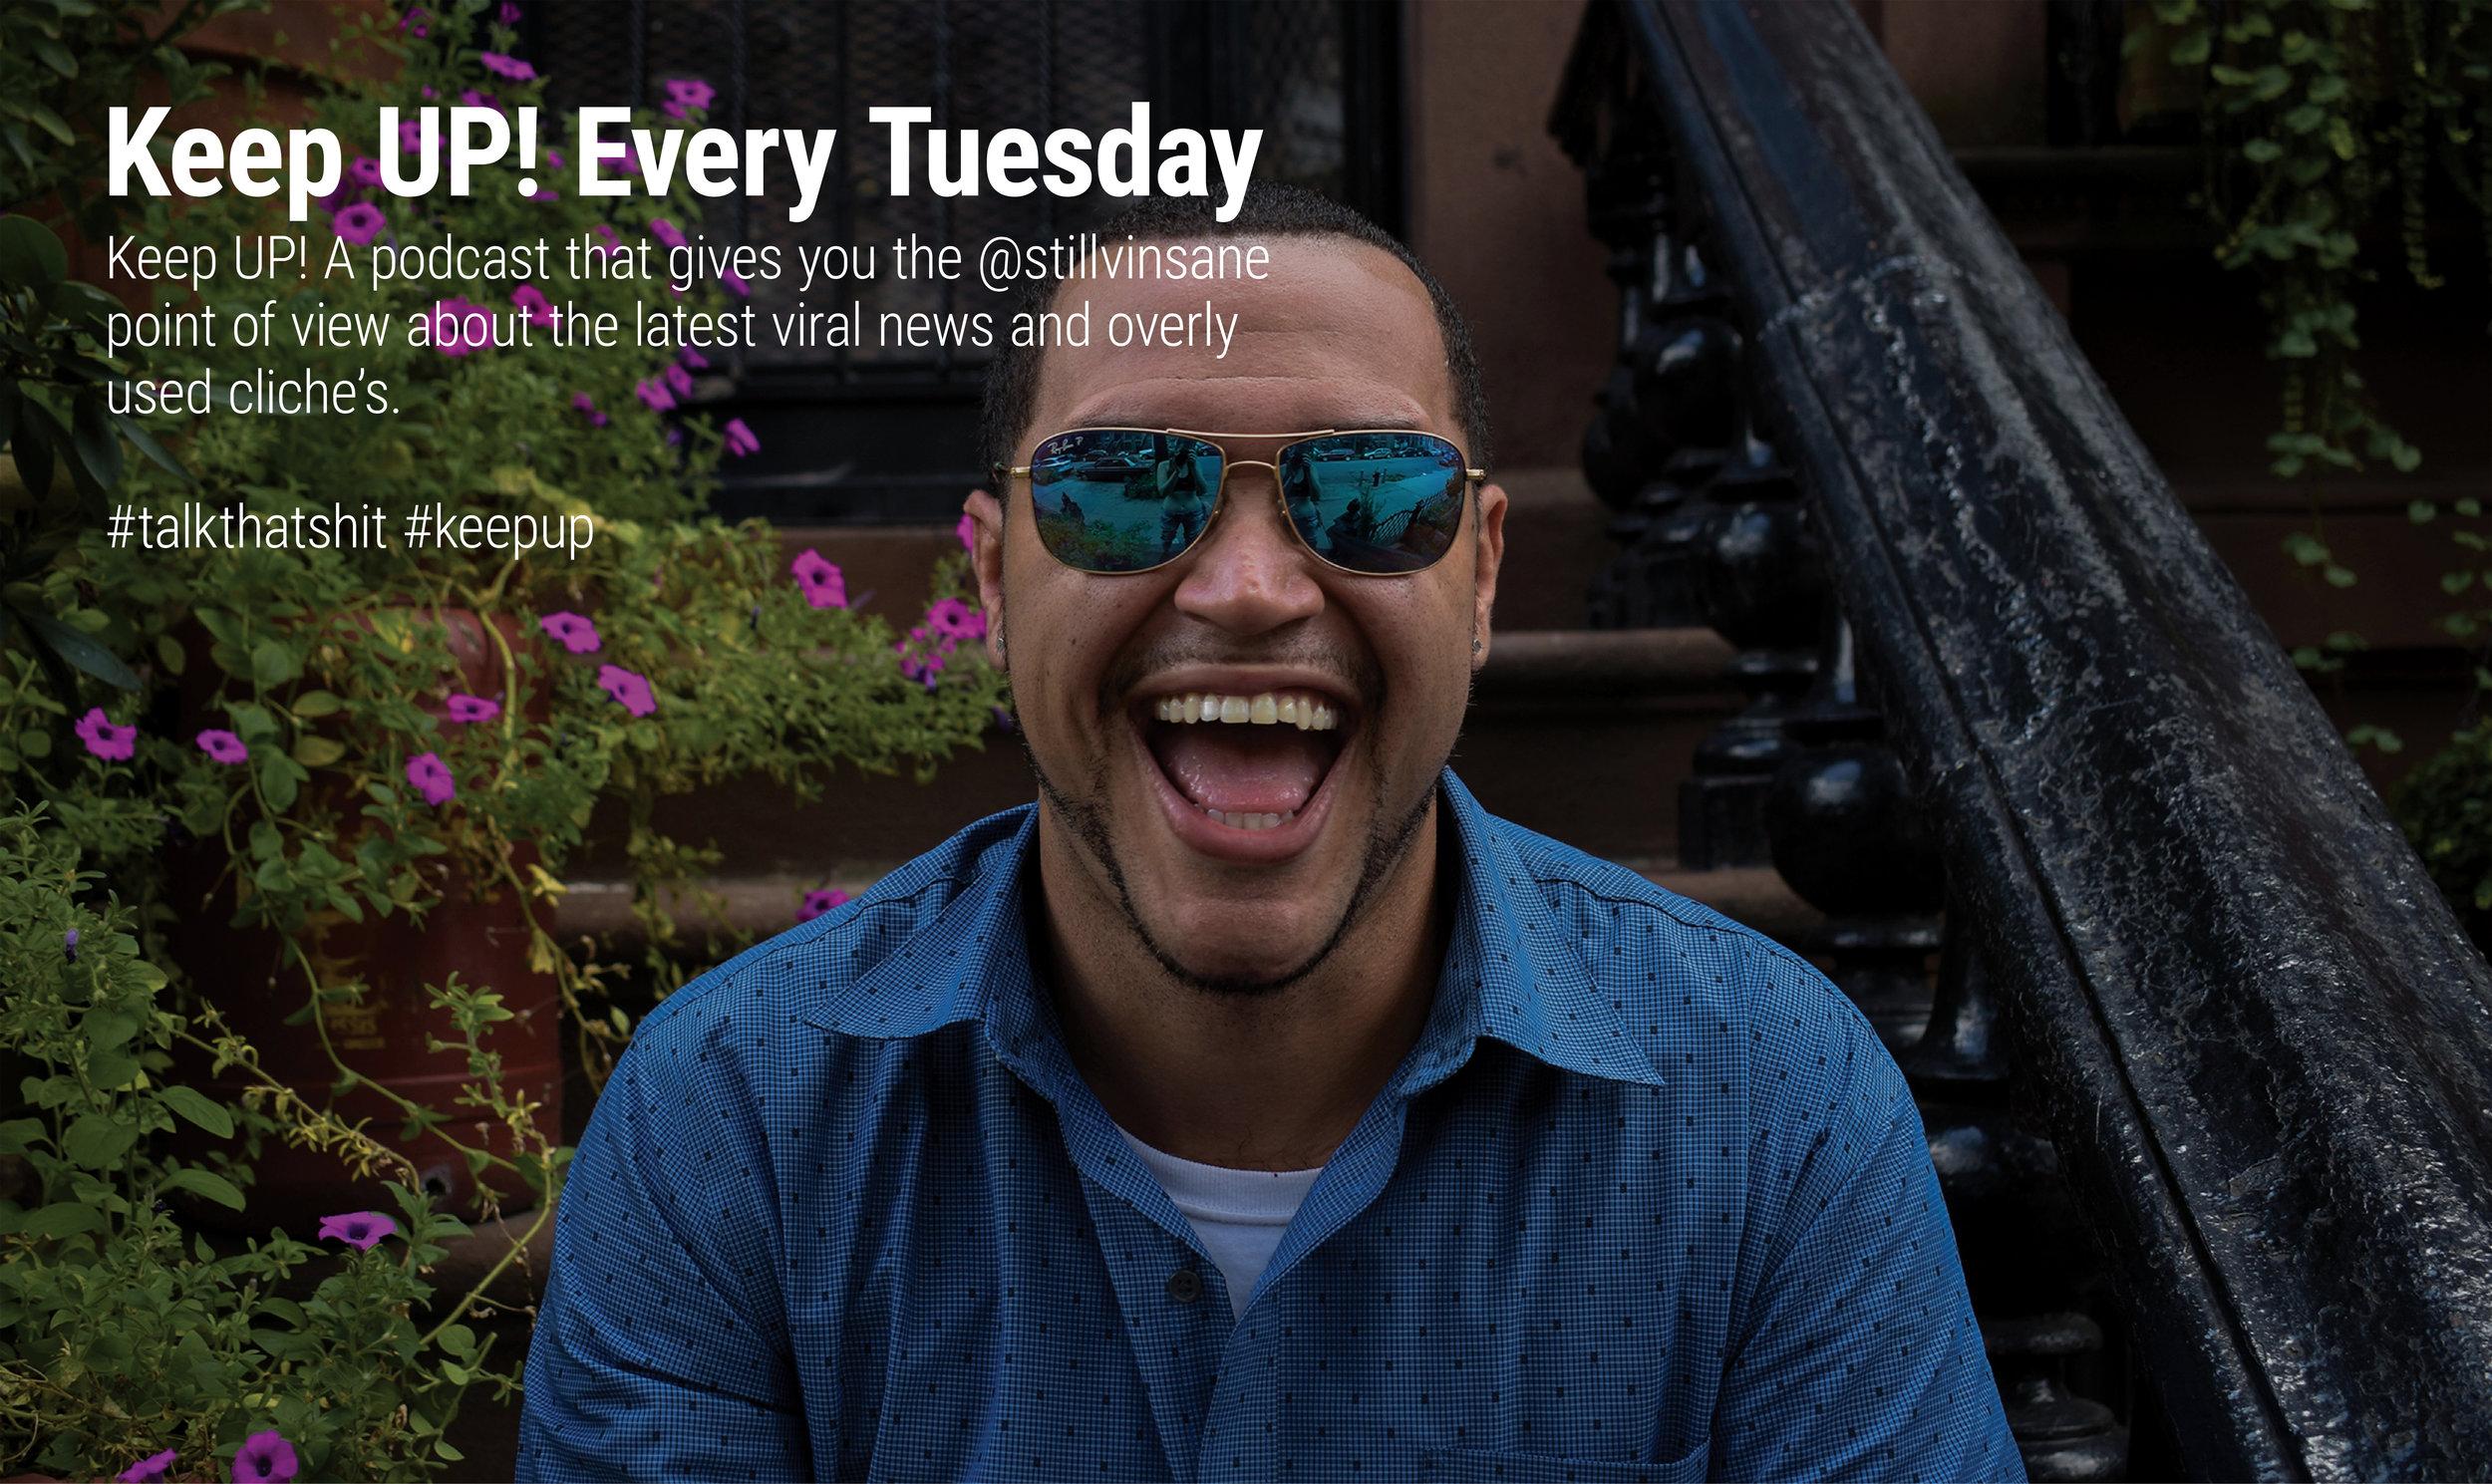 DECEMBER_sitebanner_every tuesday.jpg